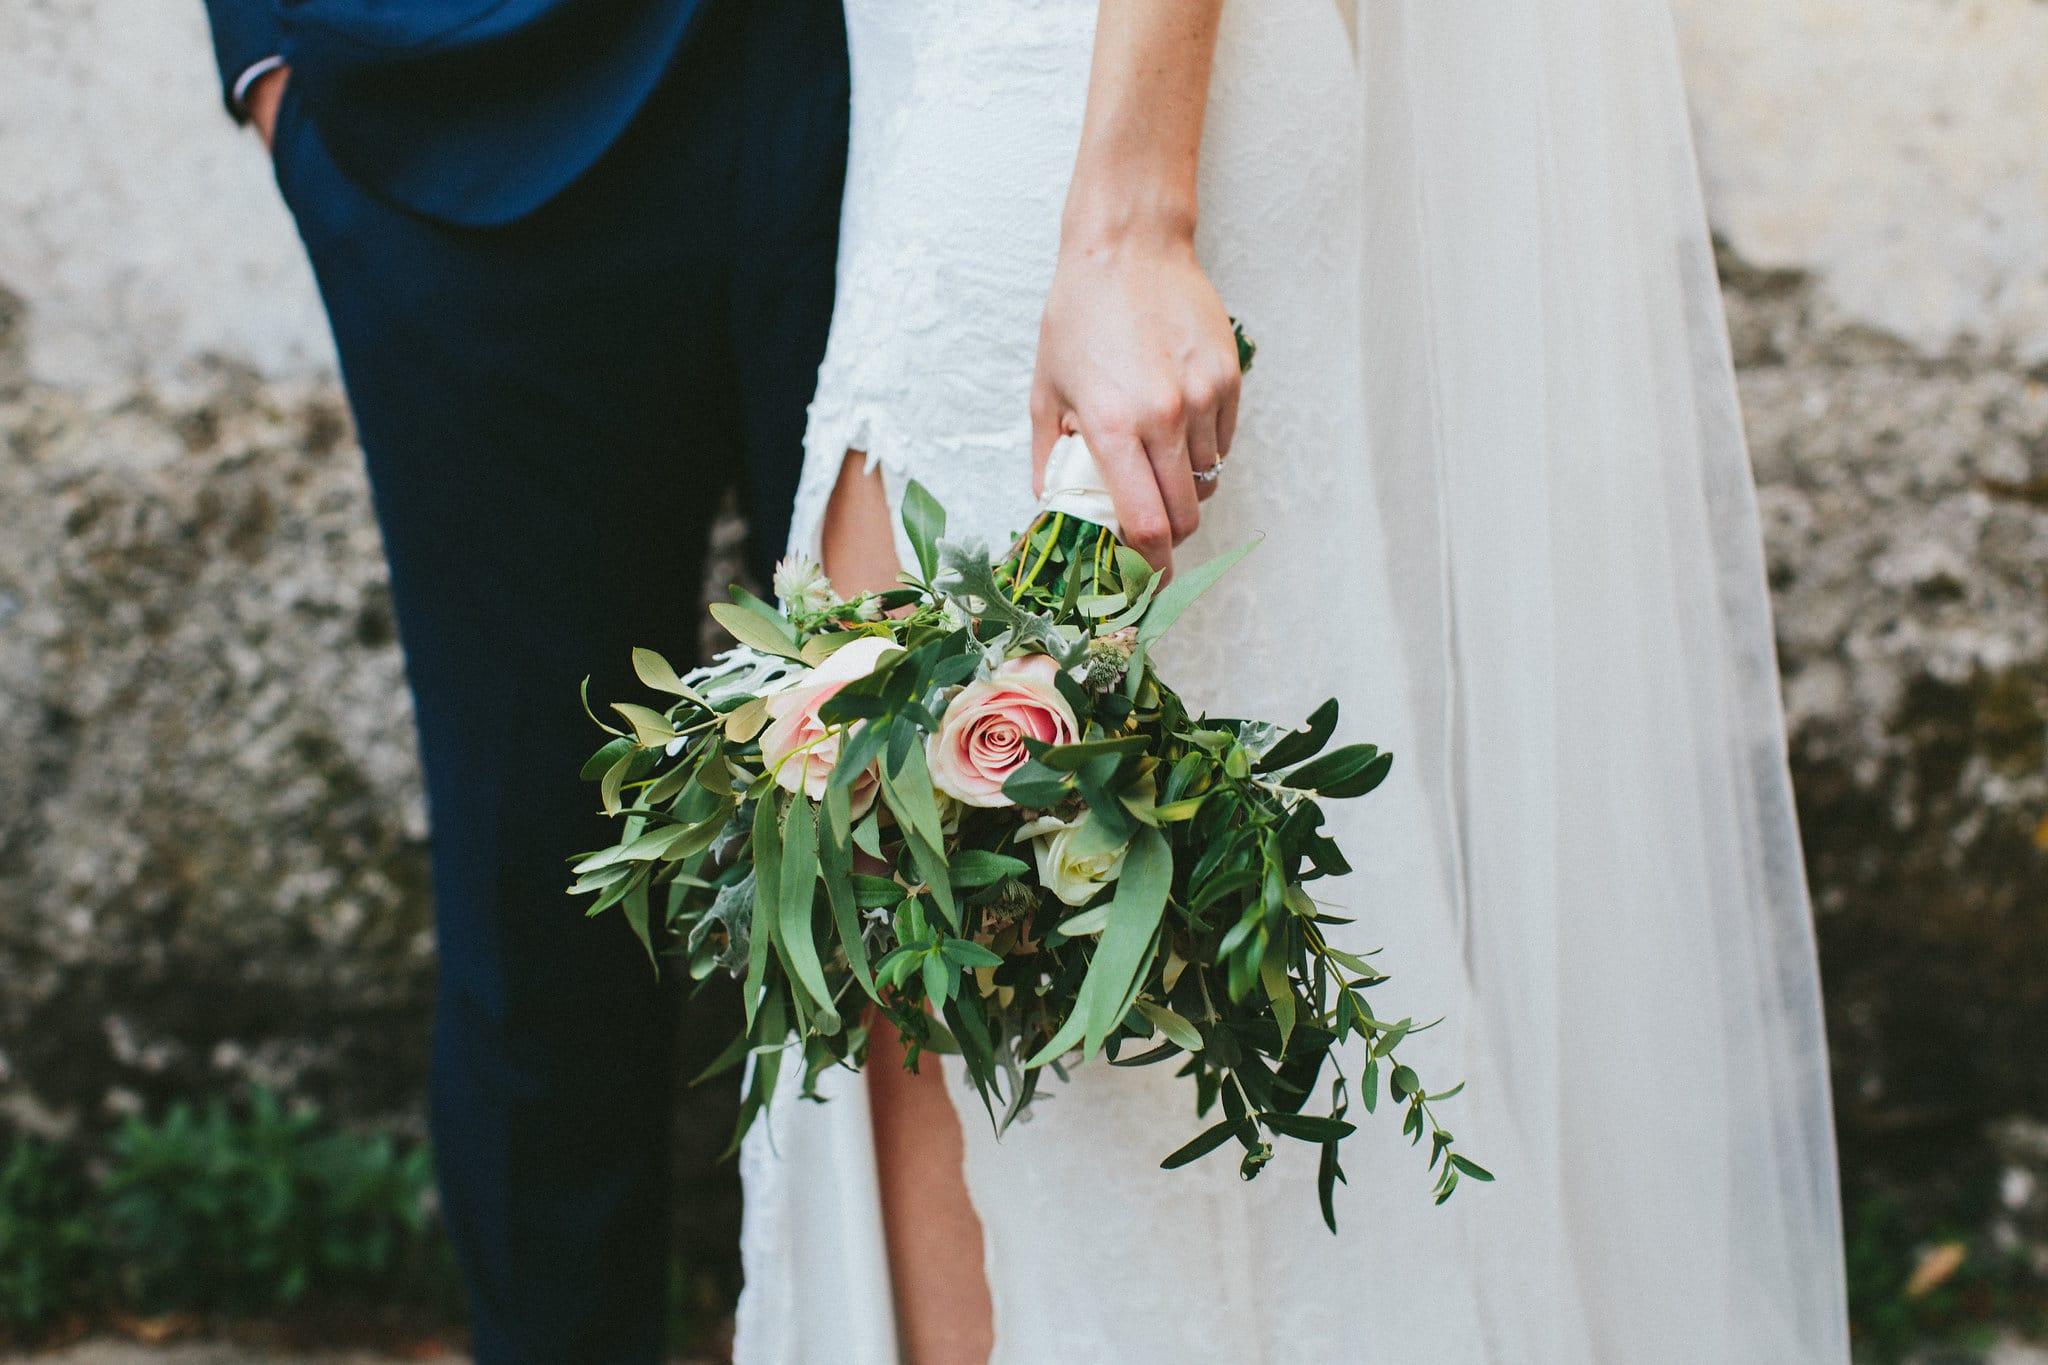 un mariage en petit comit ravel photos antony merat blog mariage la mari e aux pieds. Black Bedroom Furniture Sets. Home Design Ideas